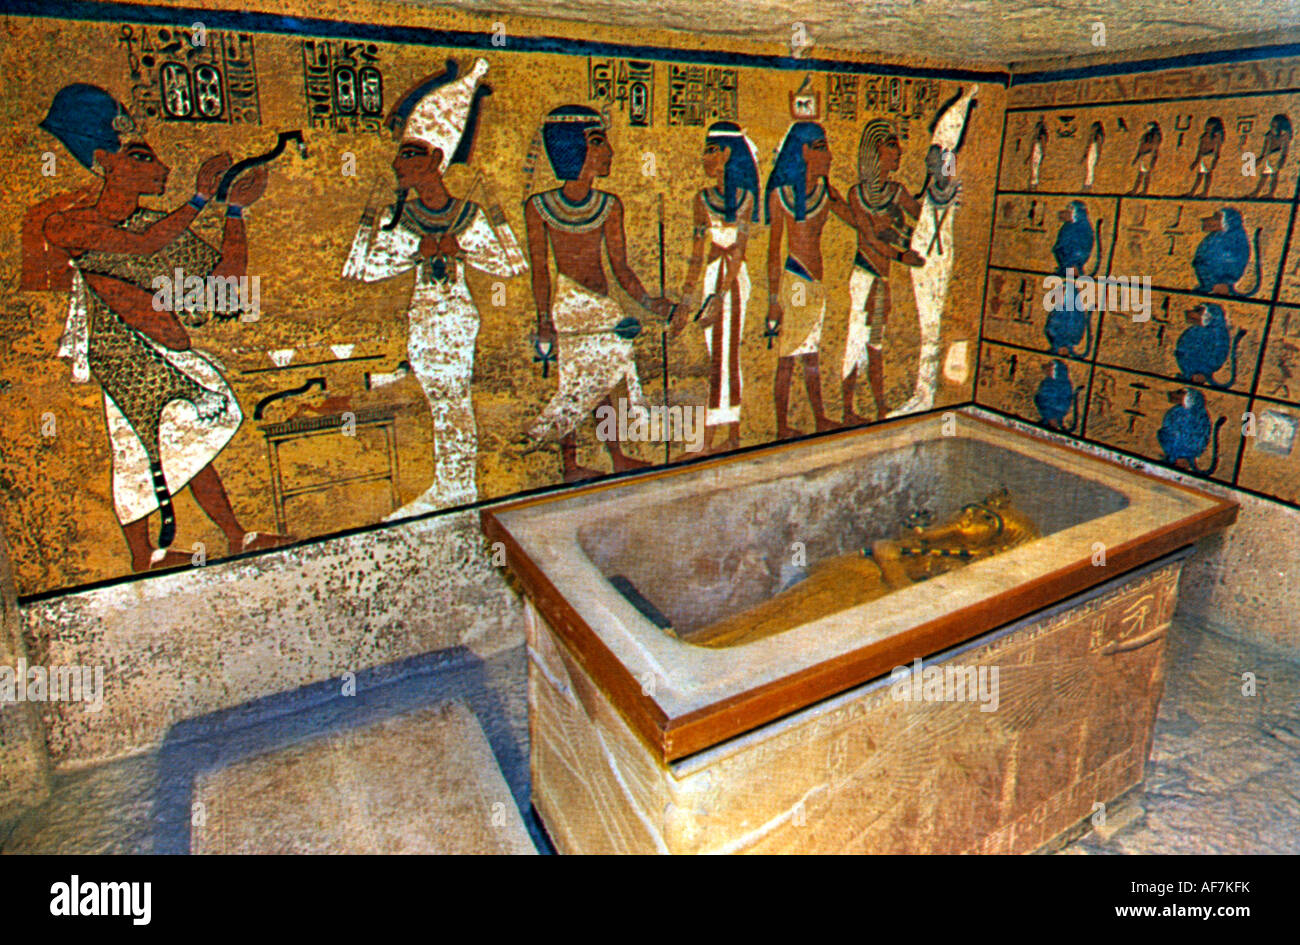 Egypt Tomb Of The Kings Mummy Of Tutankhamun In Golden ...